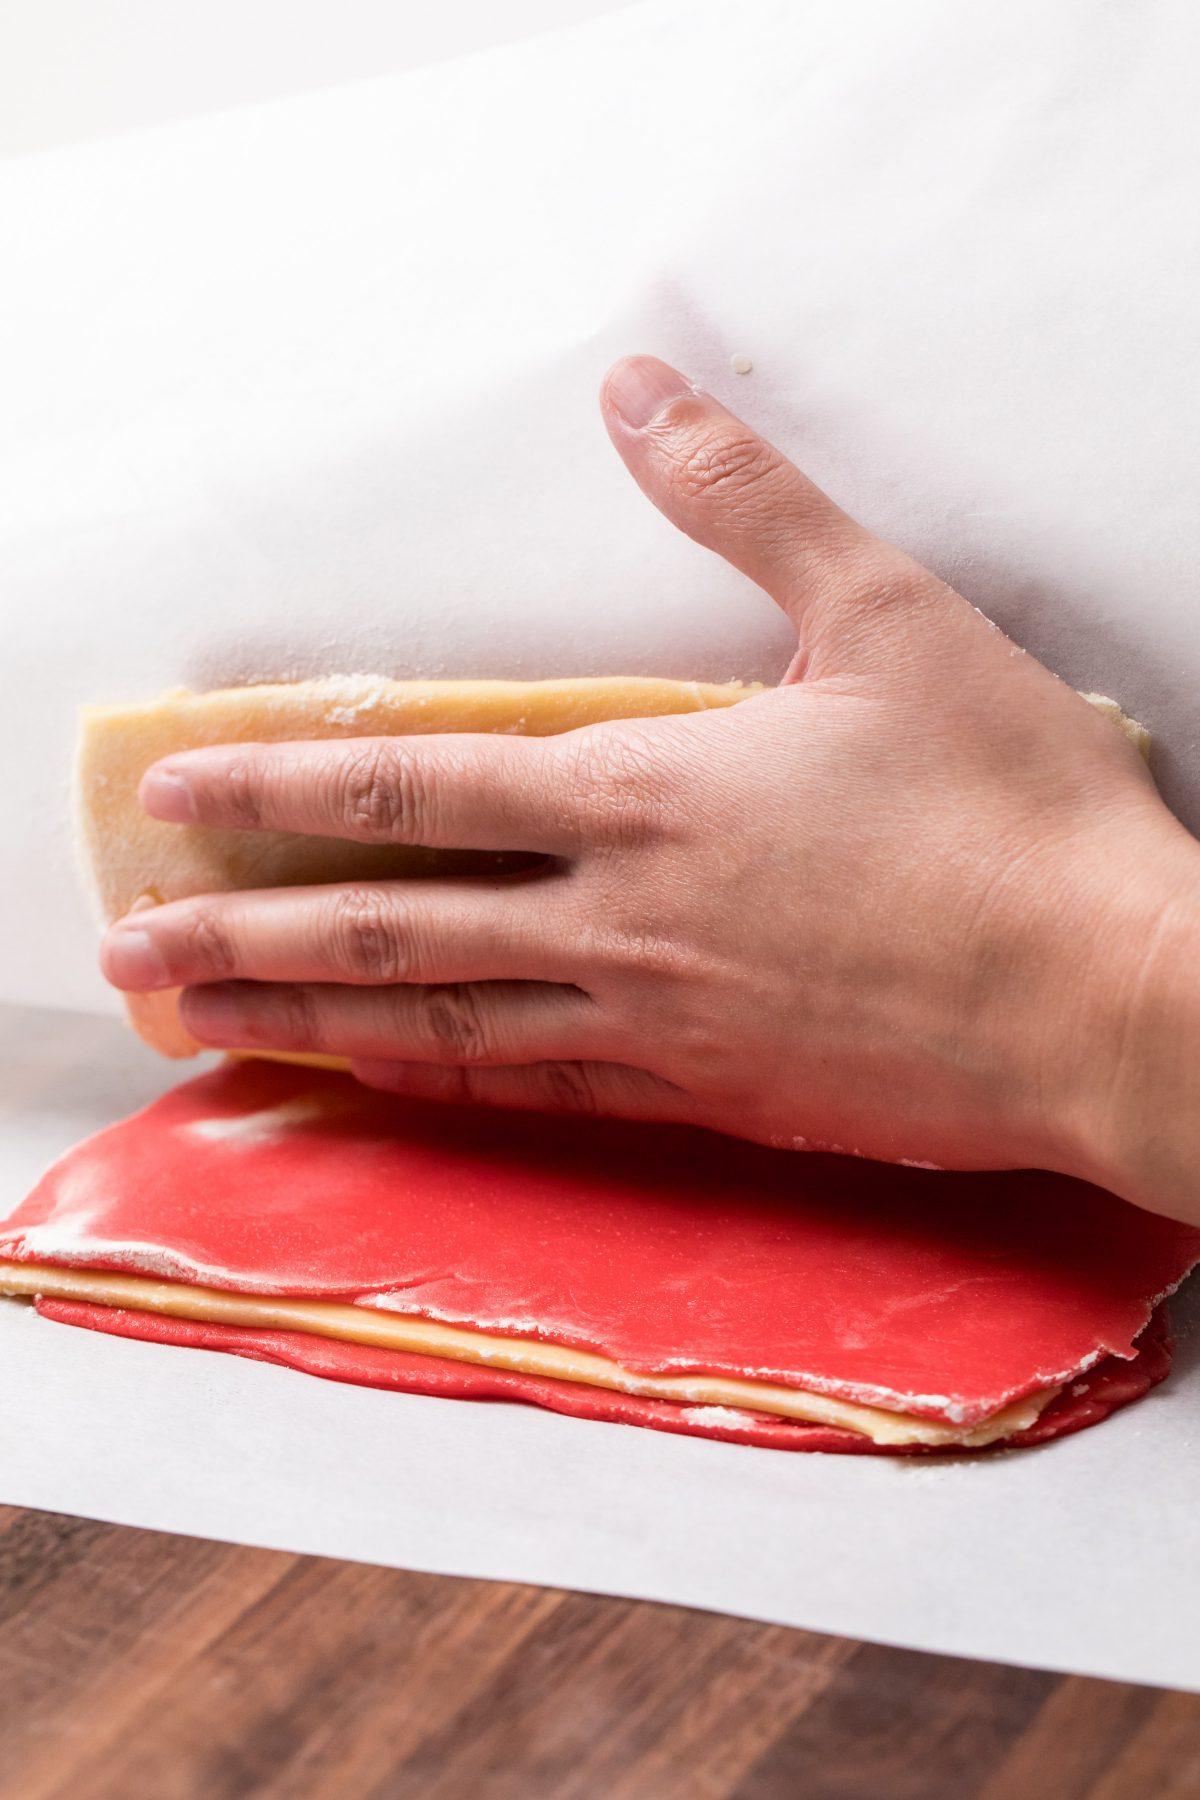 5D4B6574 - Holiday Pinwheel Cookies - Layer the sheets of dough